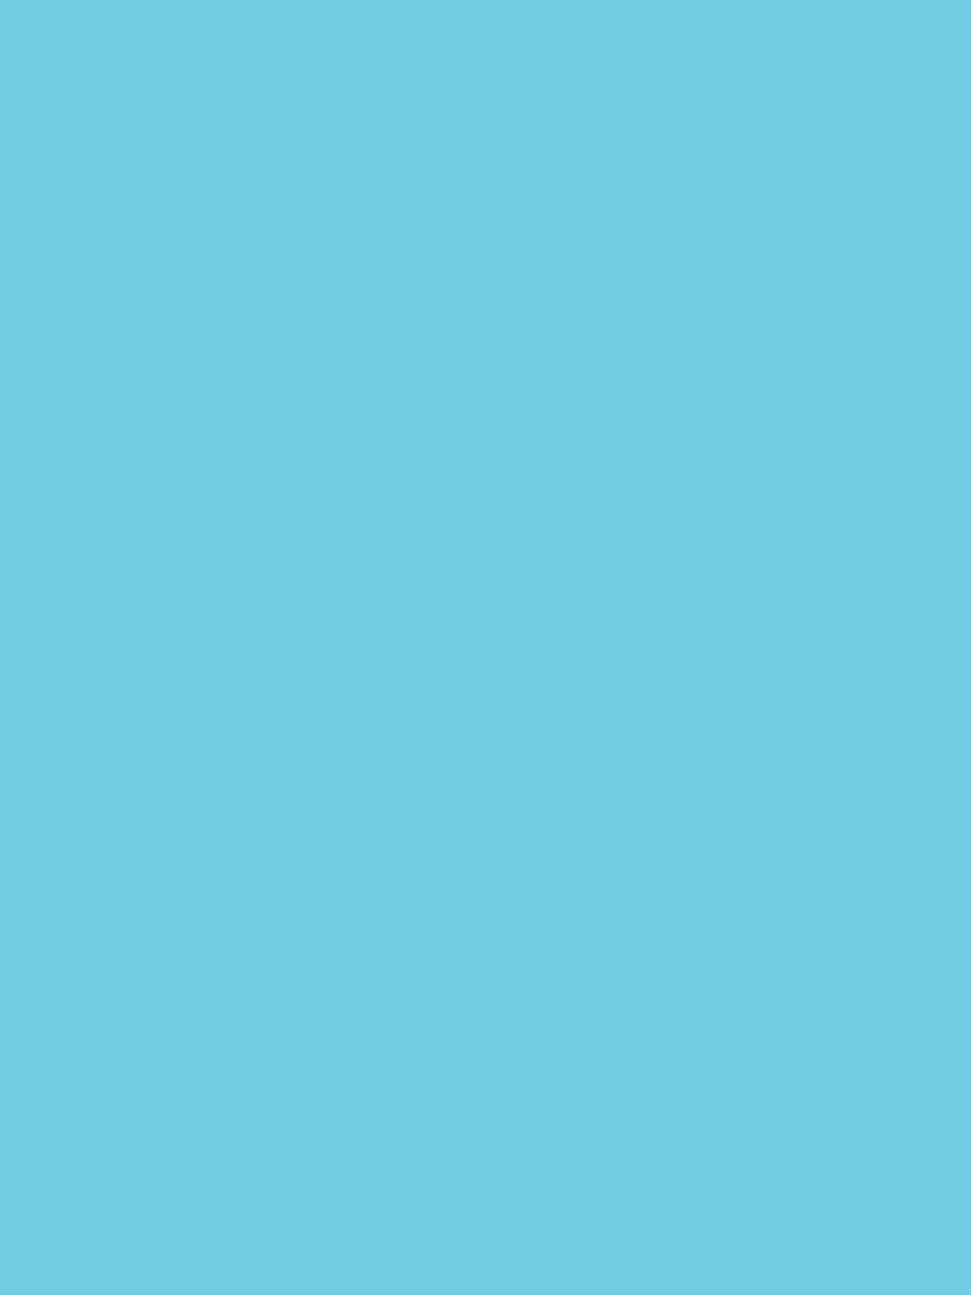 Cheers Happy Couple light blue- pms 305c | I Doooo! | Pinterest ...